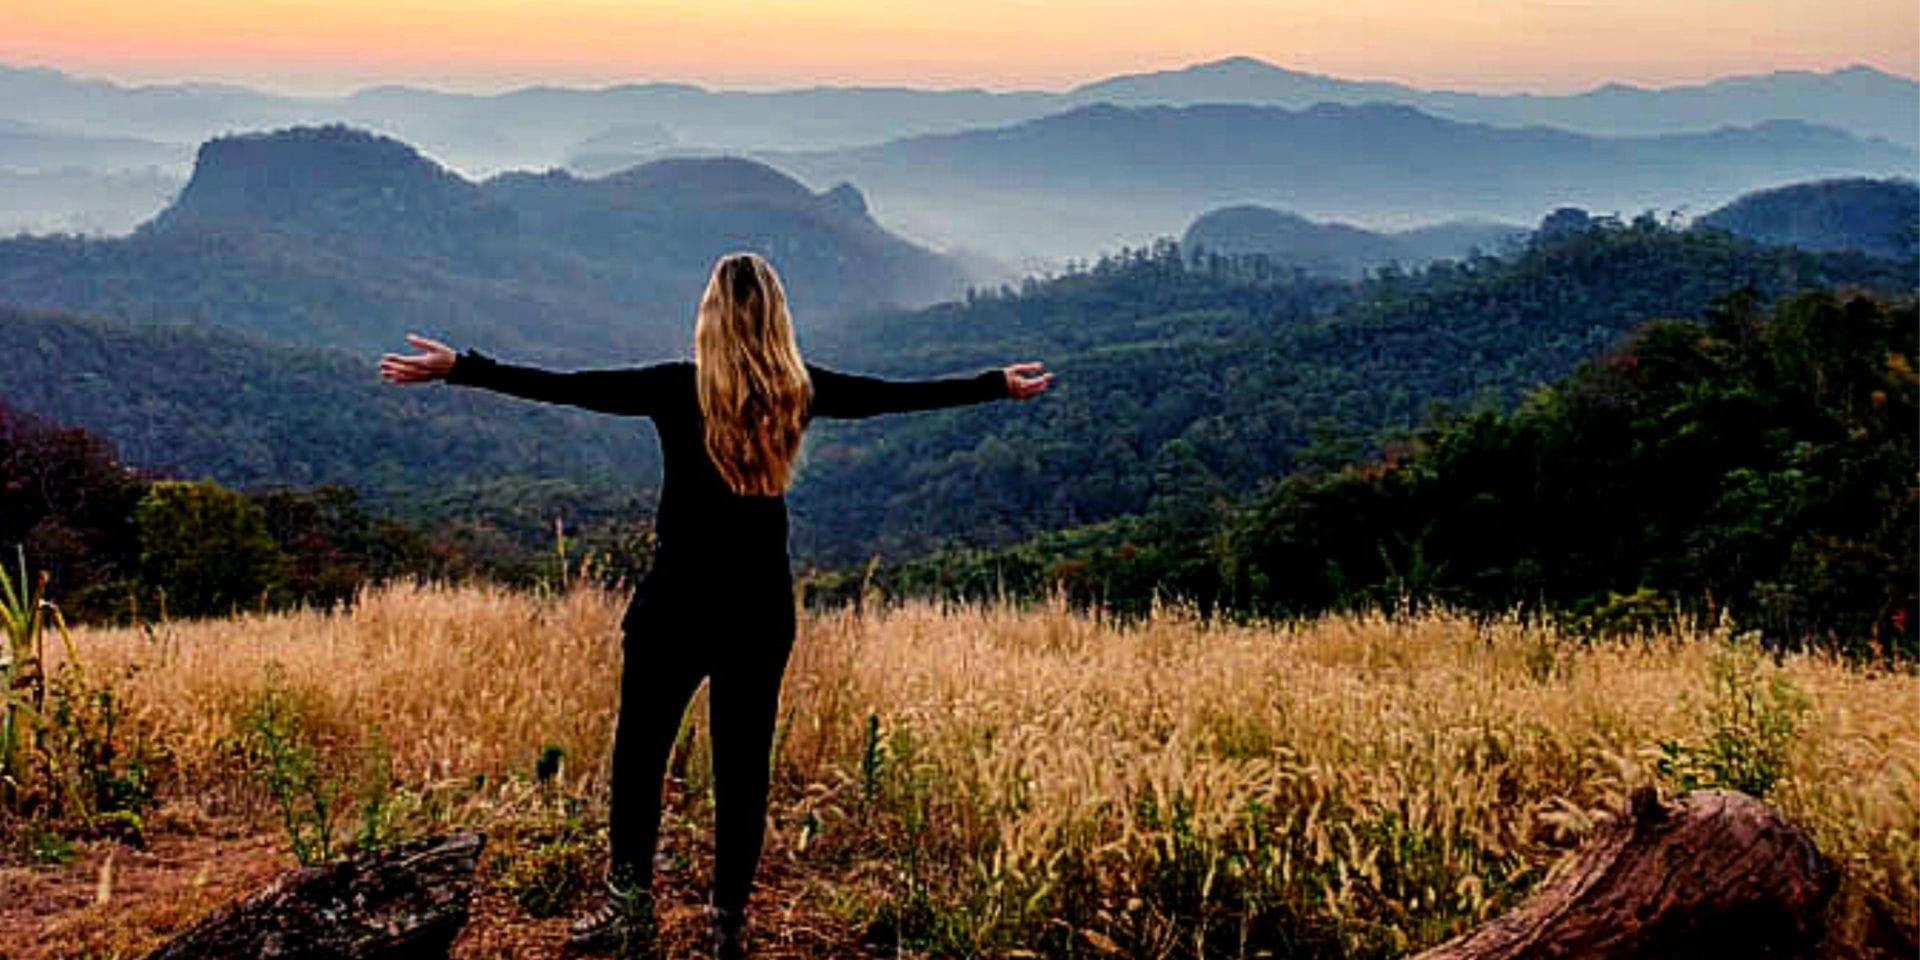 Solo traveler in Thailand